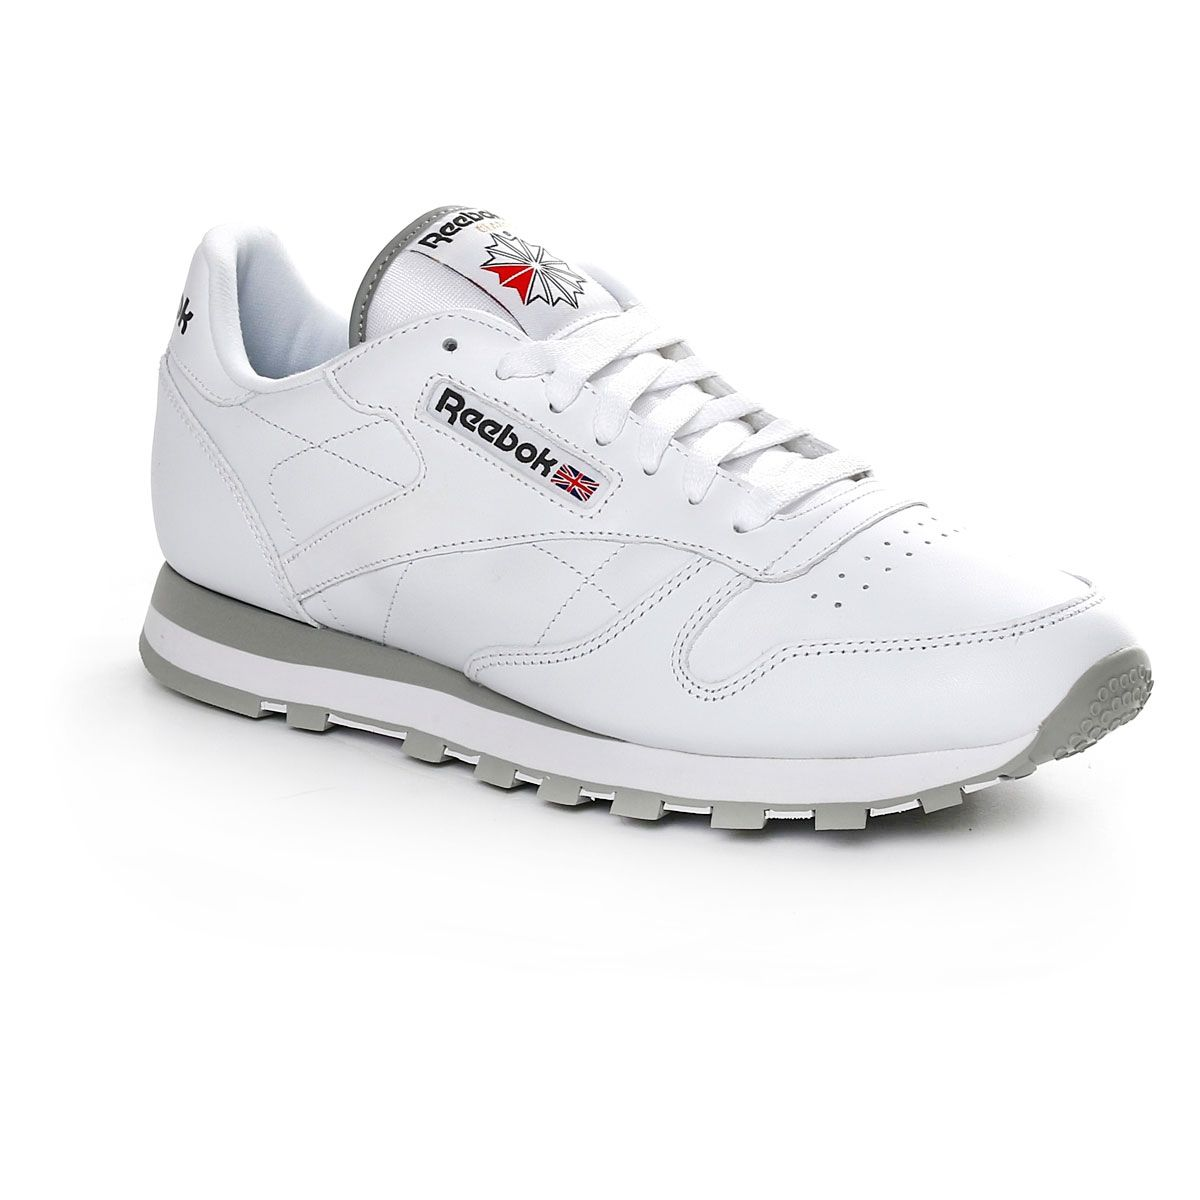 Reebok Classic Leather White Grey